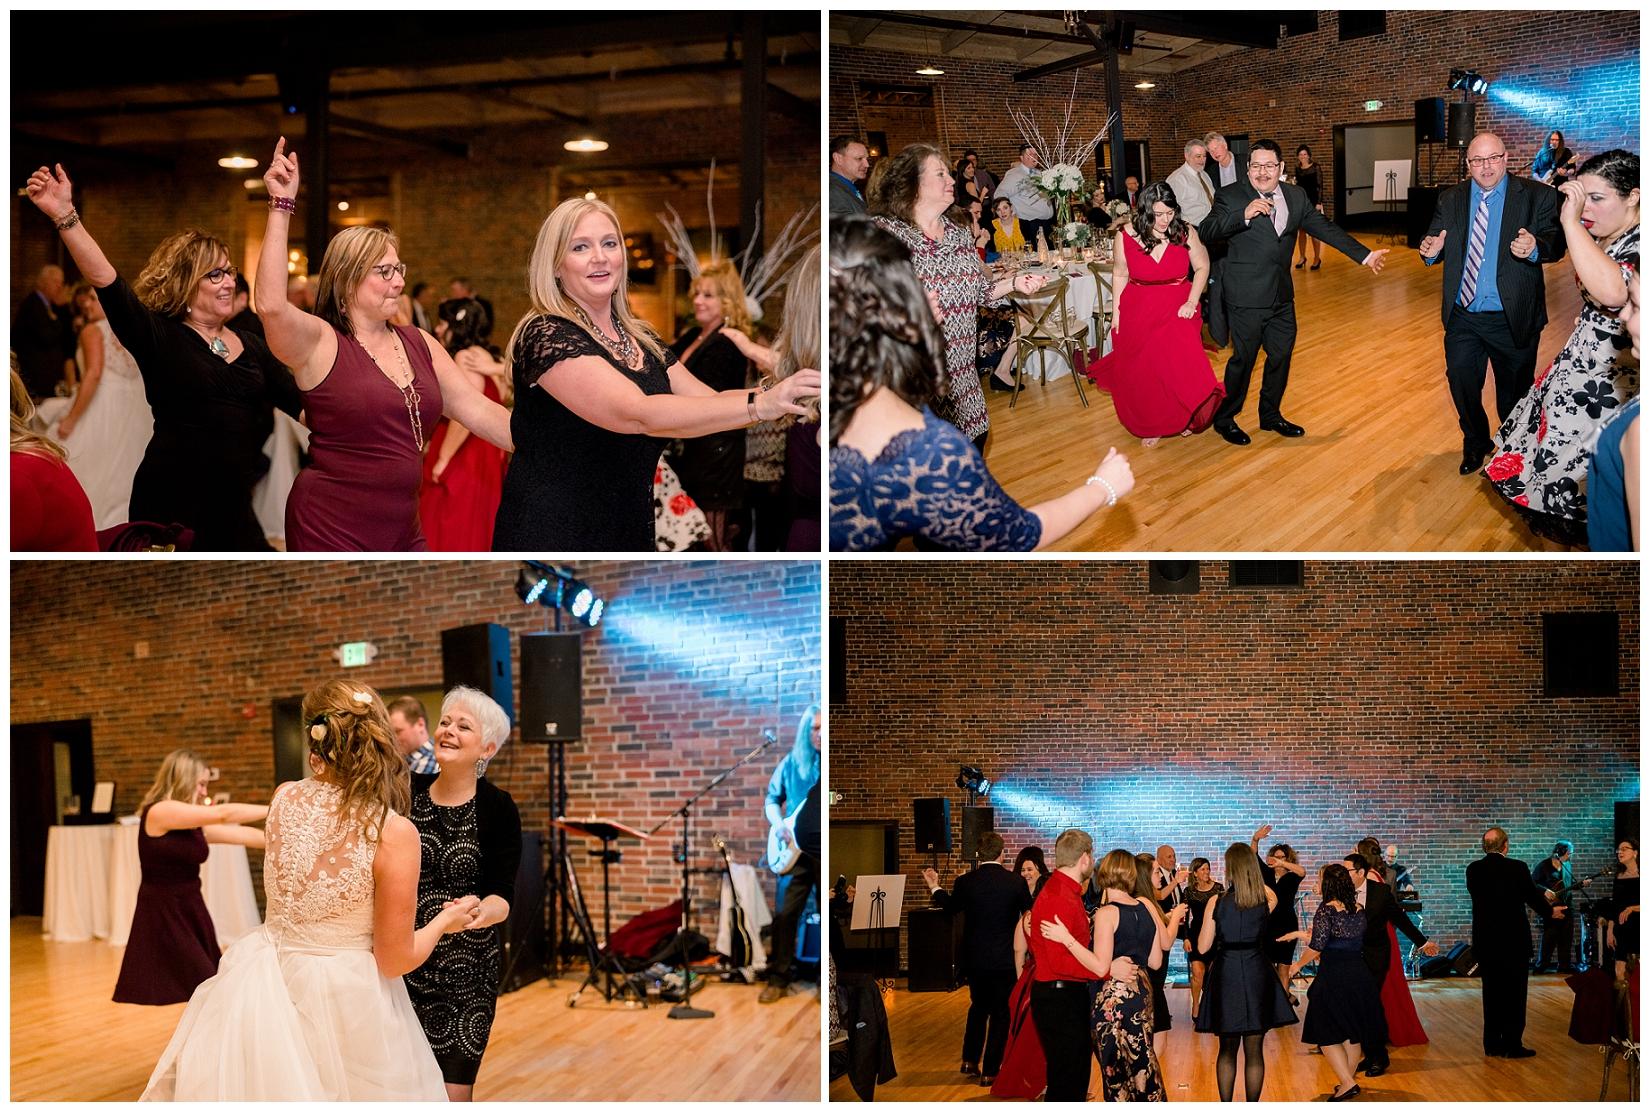 cat-alkire-wedding-photographer-indiana-chicago-indianapolis-fort-wayne_1012.jpg